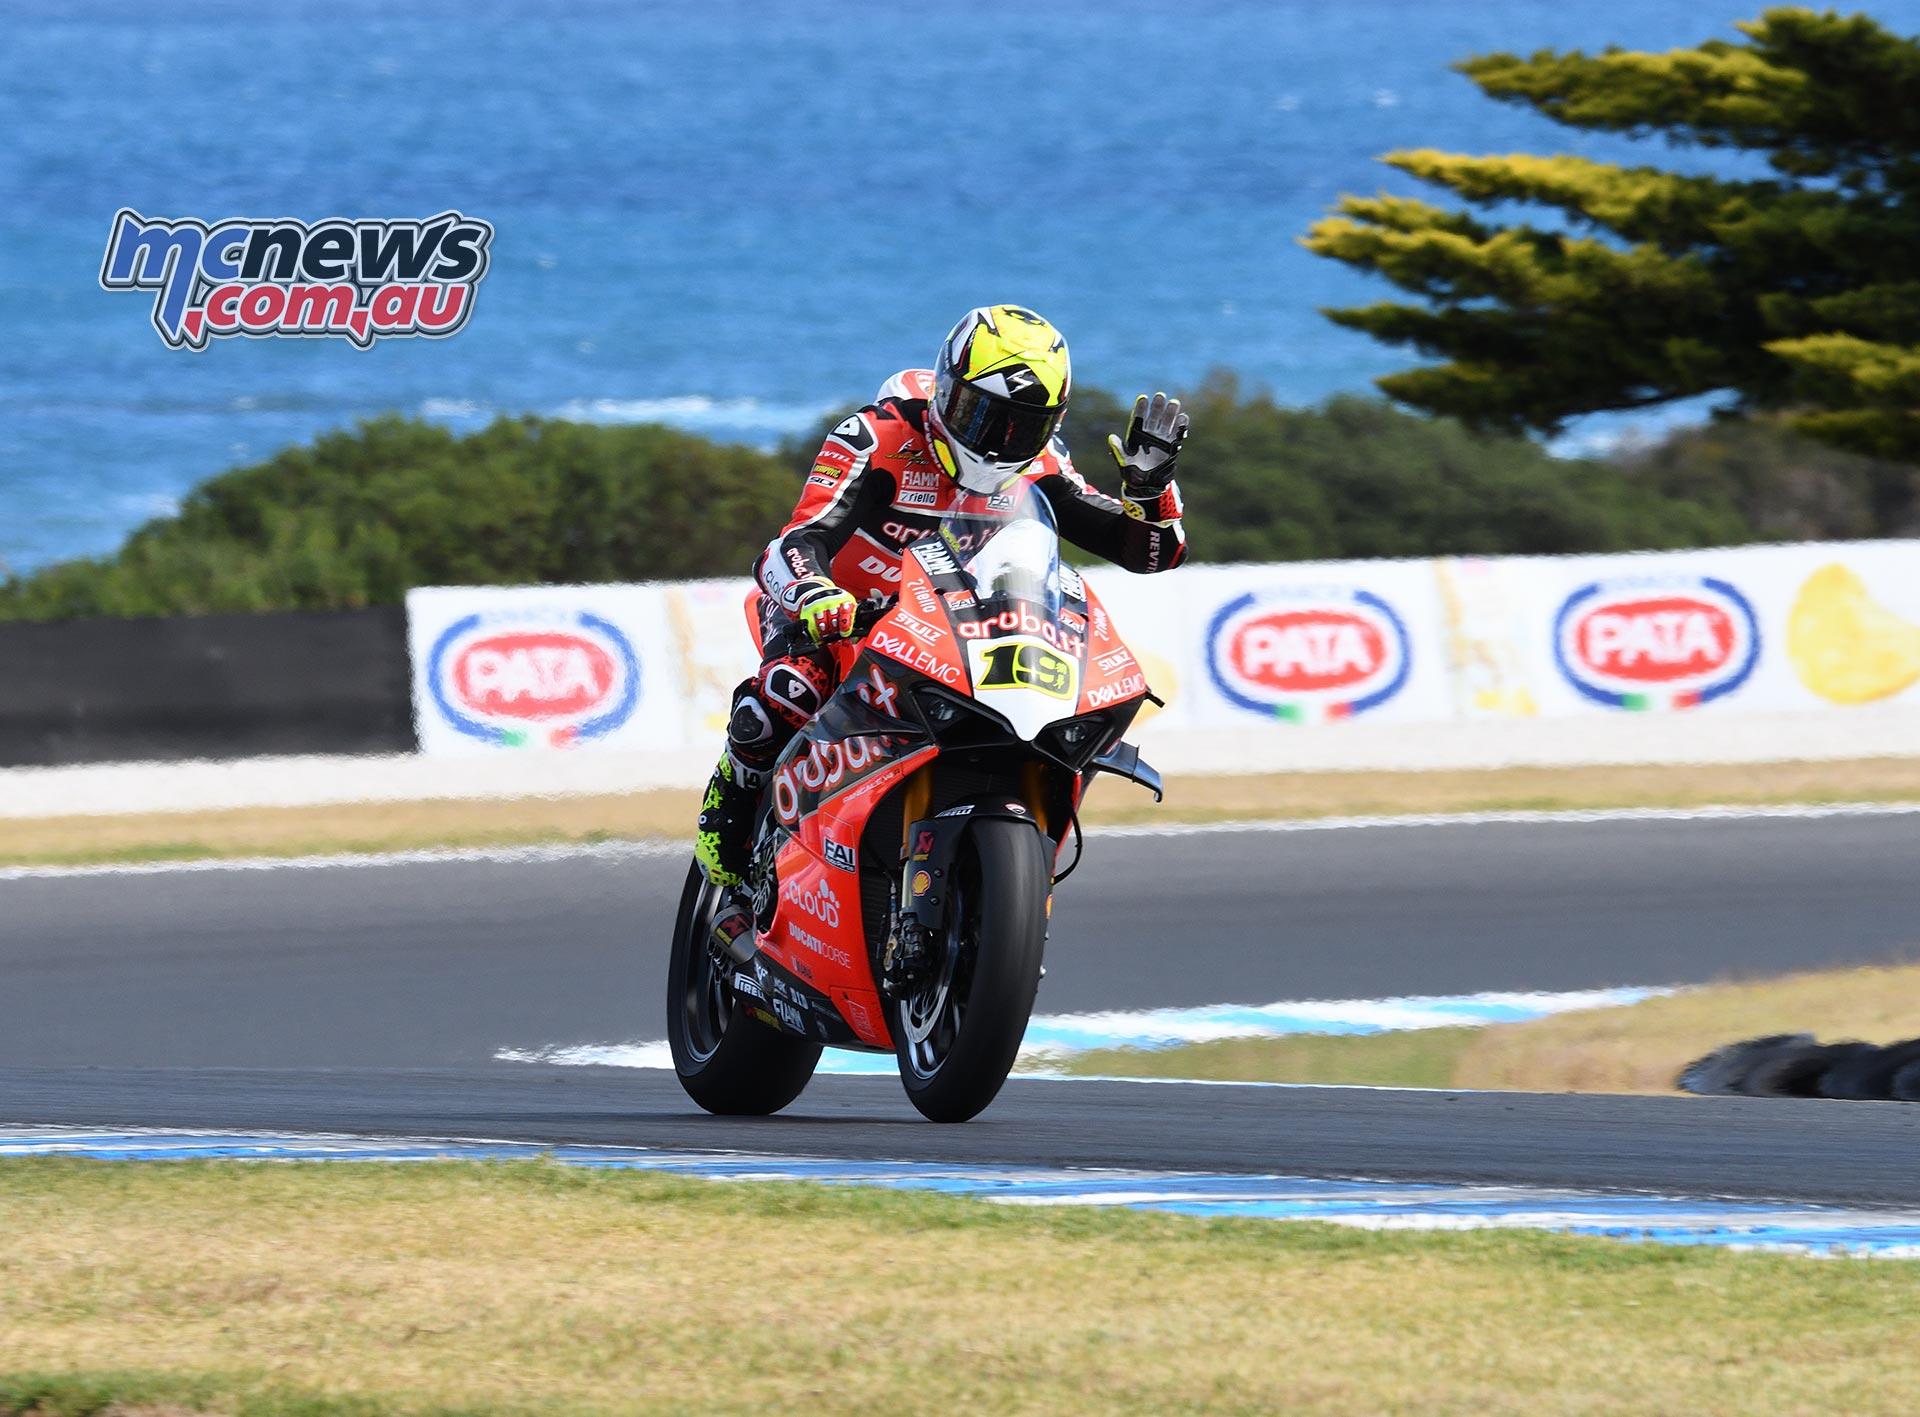 WSBK Round Phillip Island SBK Friday Rob Mott Alvaro Bautista